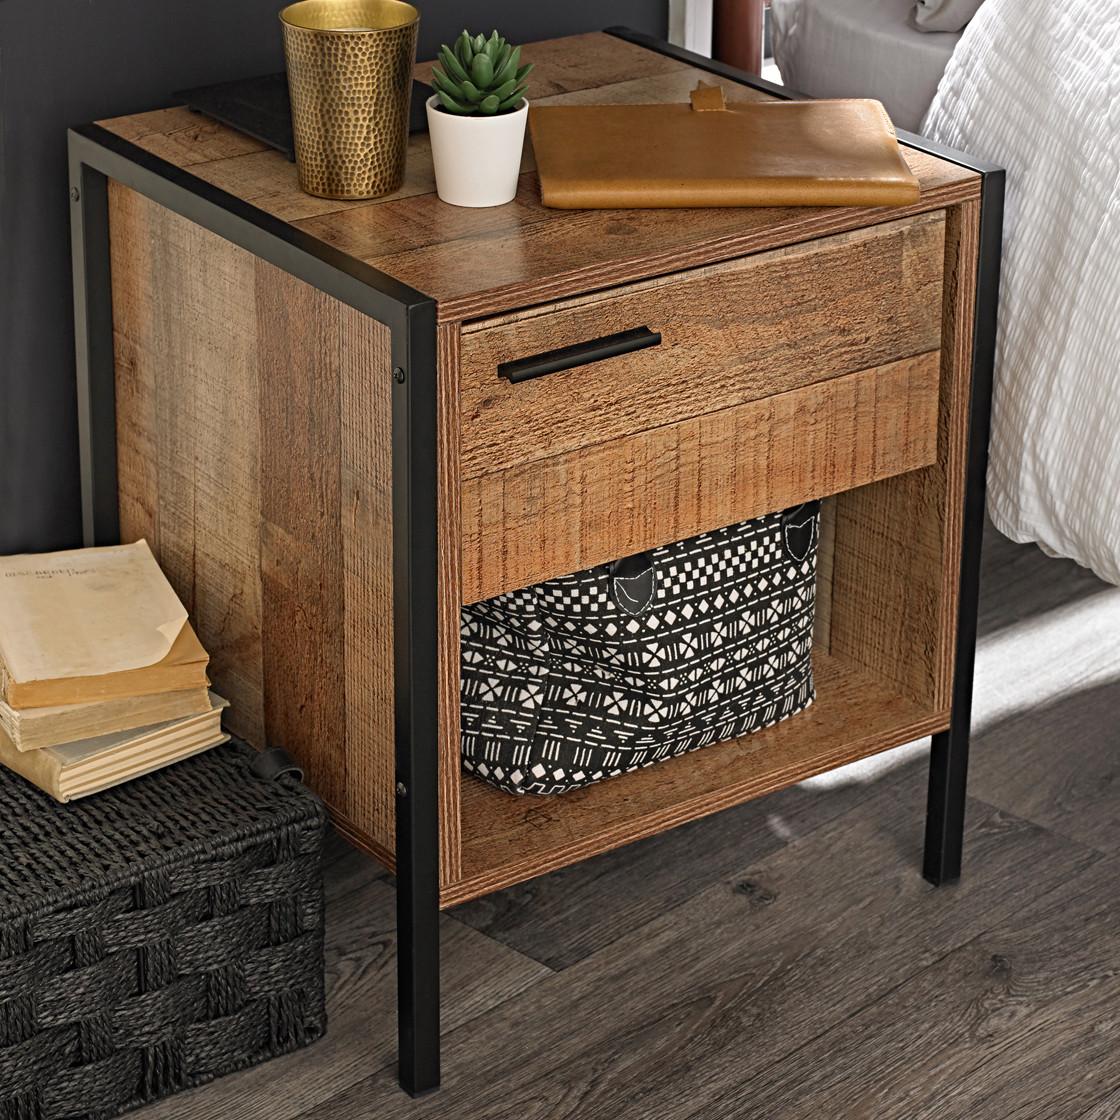 Hoxton bedside cabinet distressed oak effect